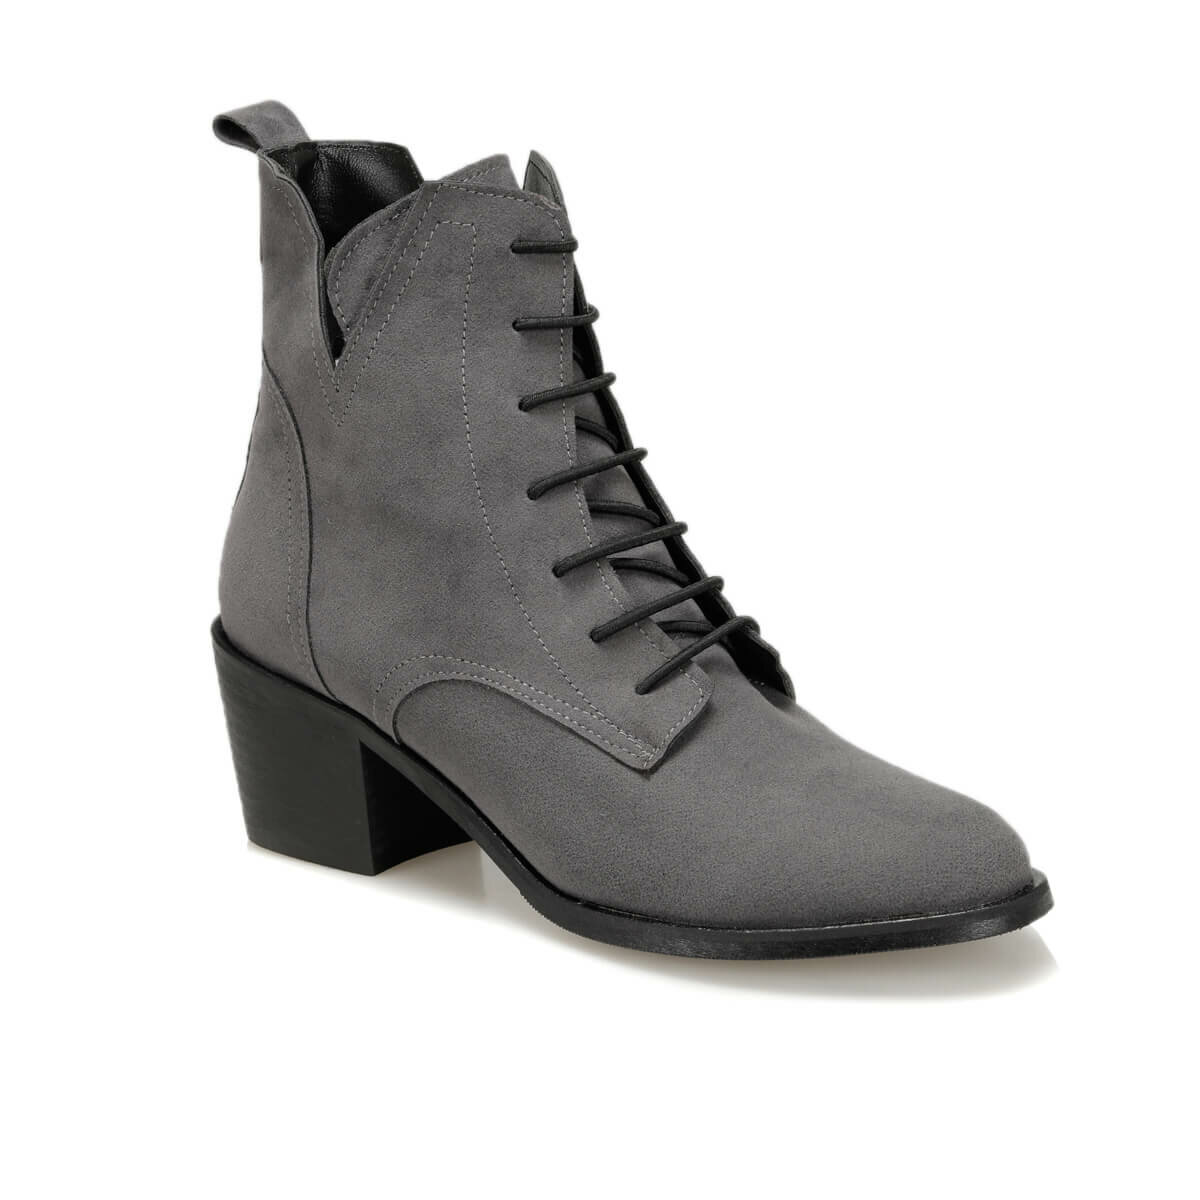 FLO OSGOODE77Z SKIN Gray Women 'S Heels Boots BUTIGO